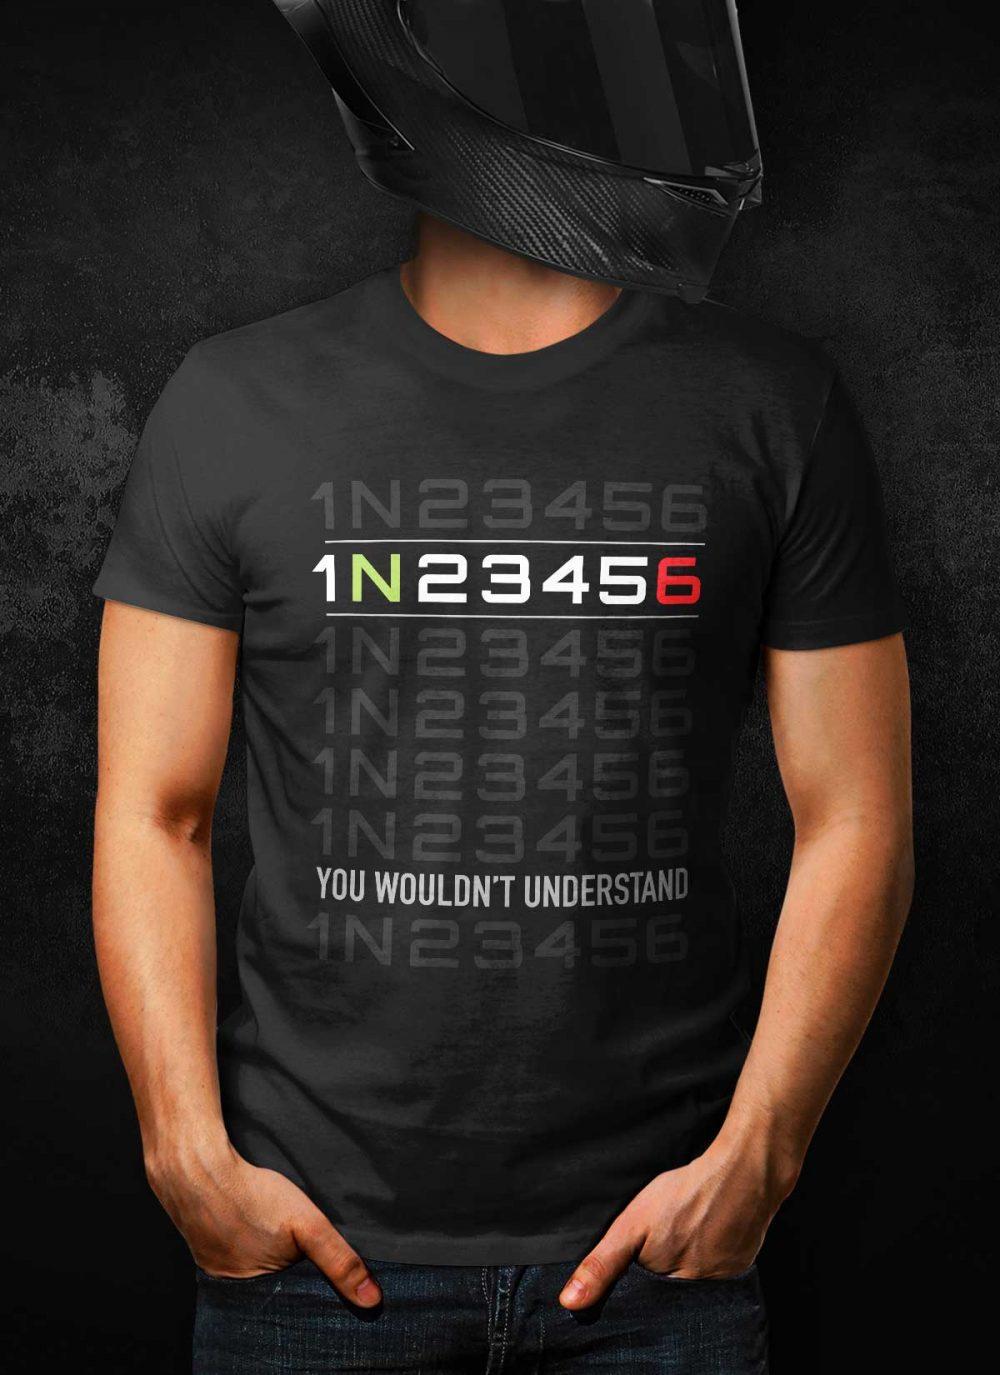 Sportsbike 1N23456 Gear Shift T-Shirt